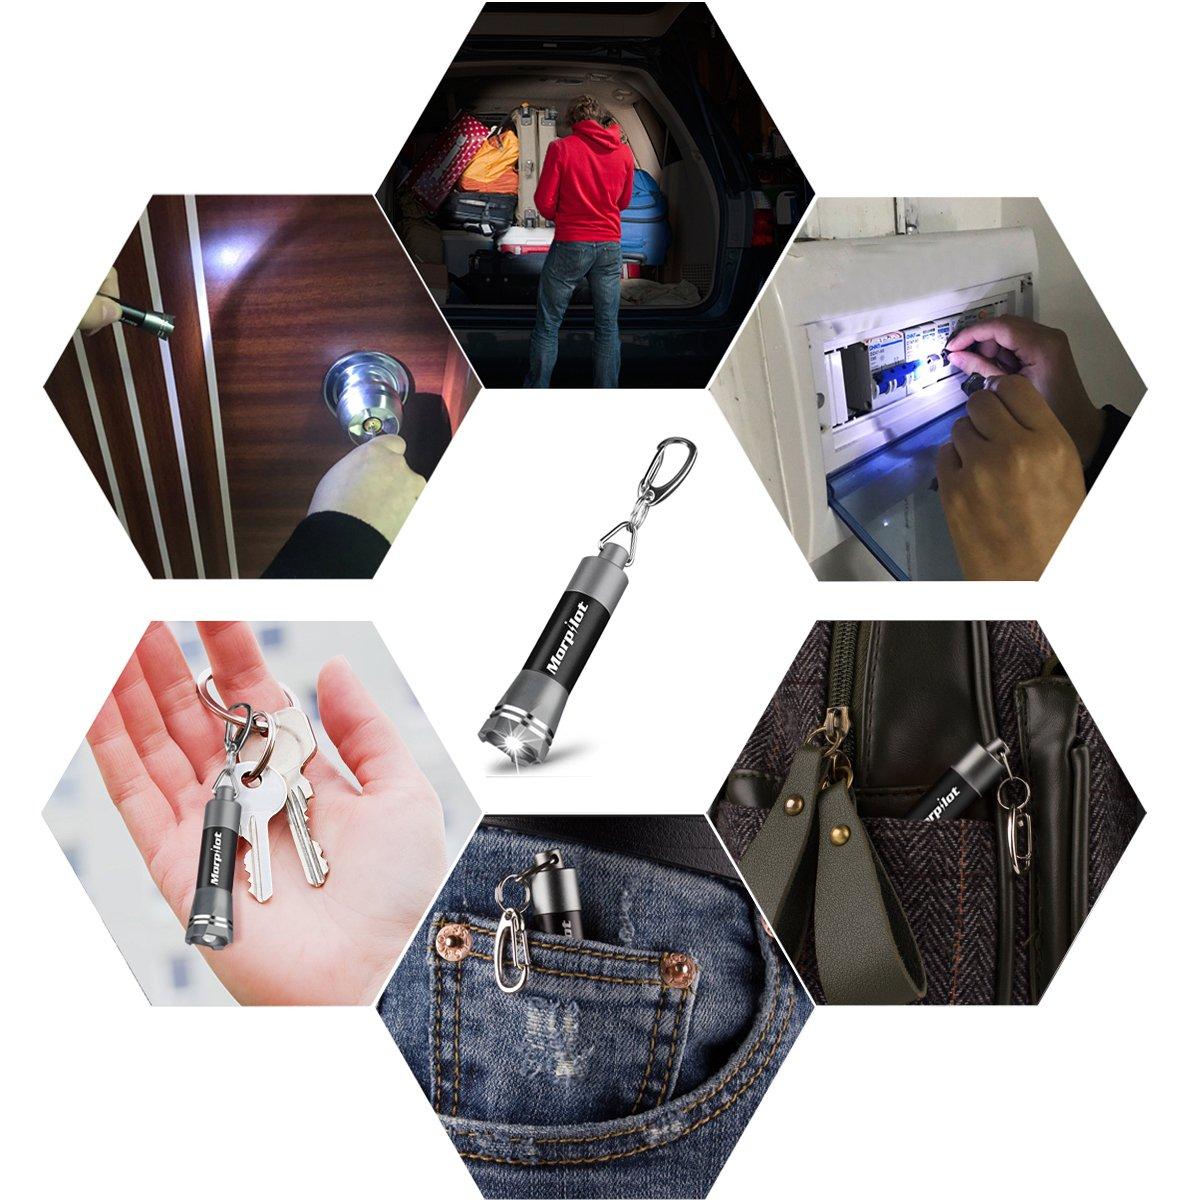 12 LED UV Flashlight Urine Detector - Morpilot Upgrade Ultraviolet Black Light Flashlight with Mini Keychain White Flashlight,for Detect Bed Carpet Bug Dog Urine Stain Scorpion